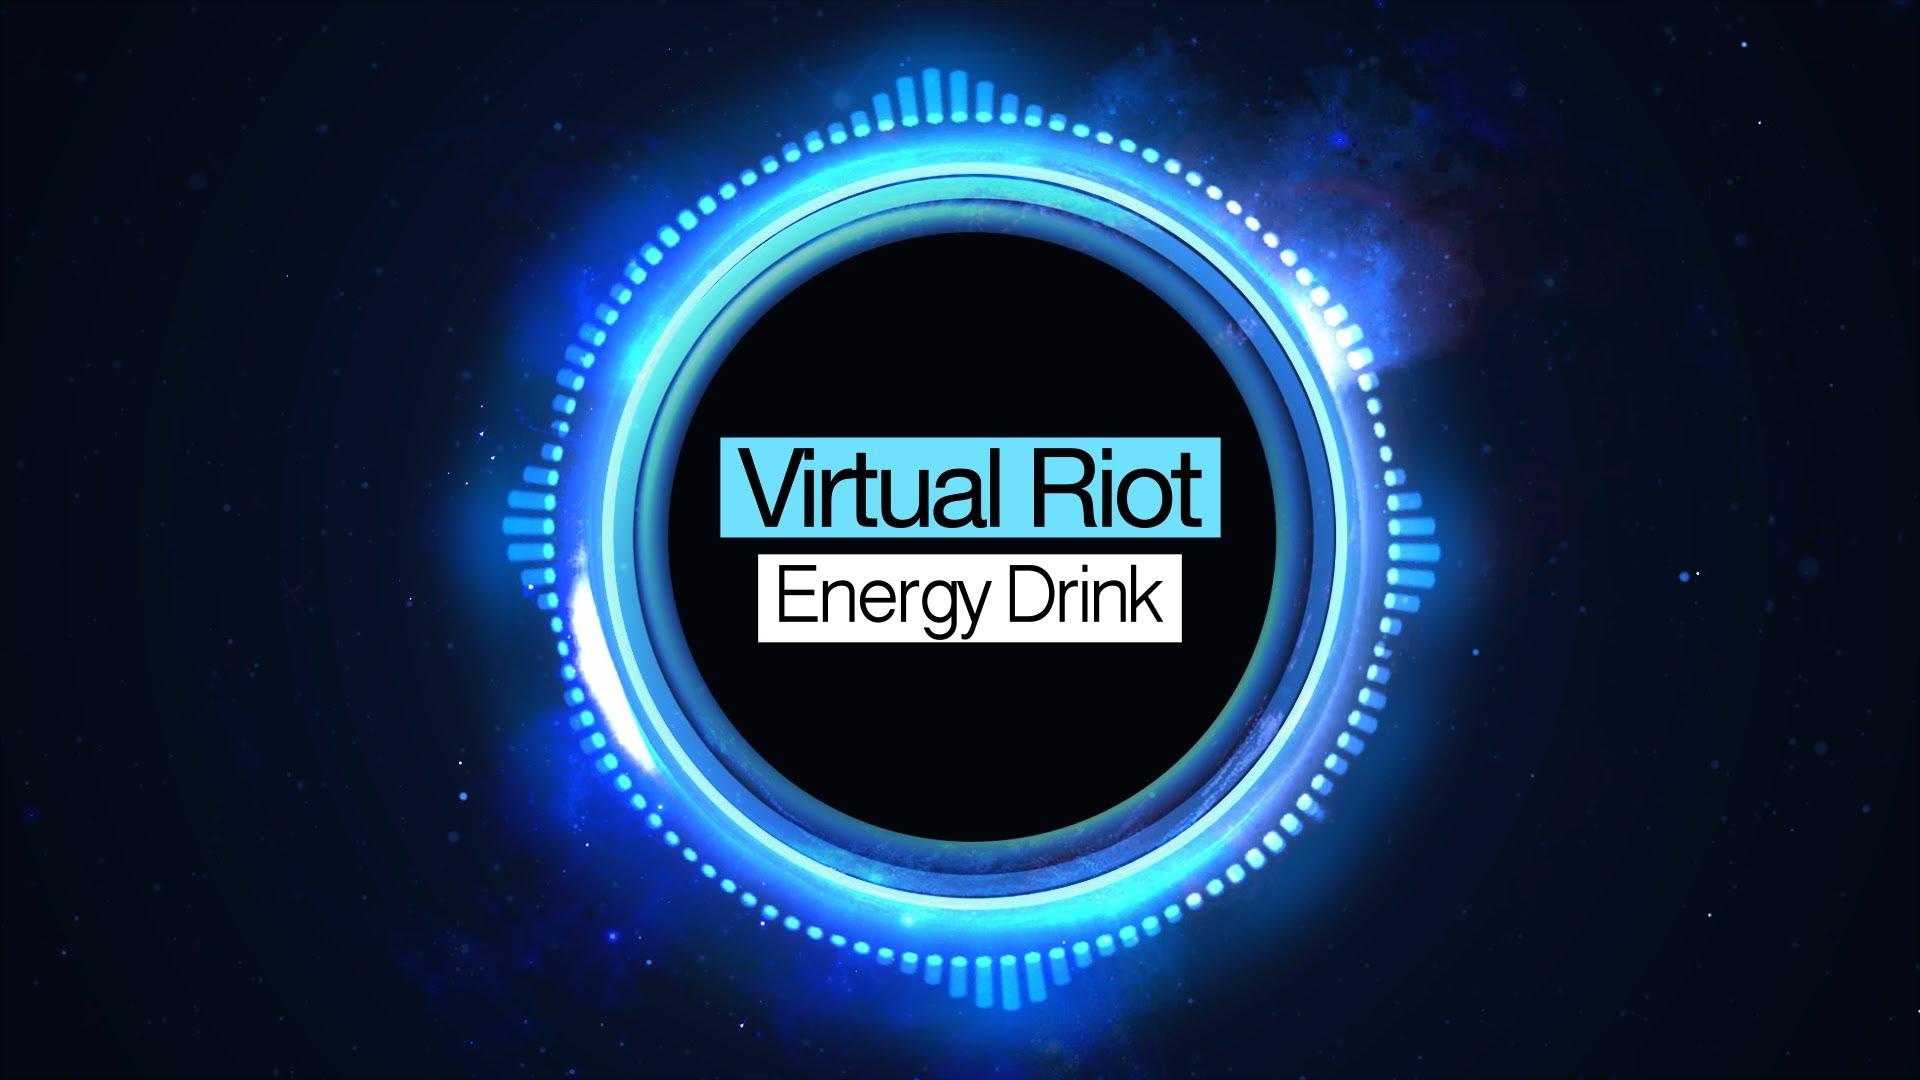 50+] Virtual Riot Wallpaper on WallpaperSafari